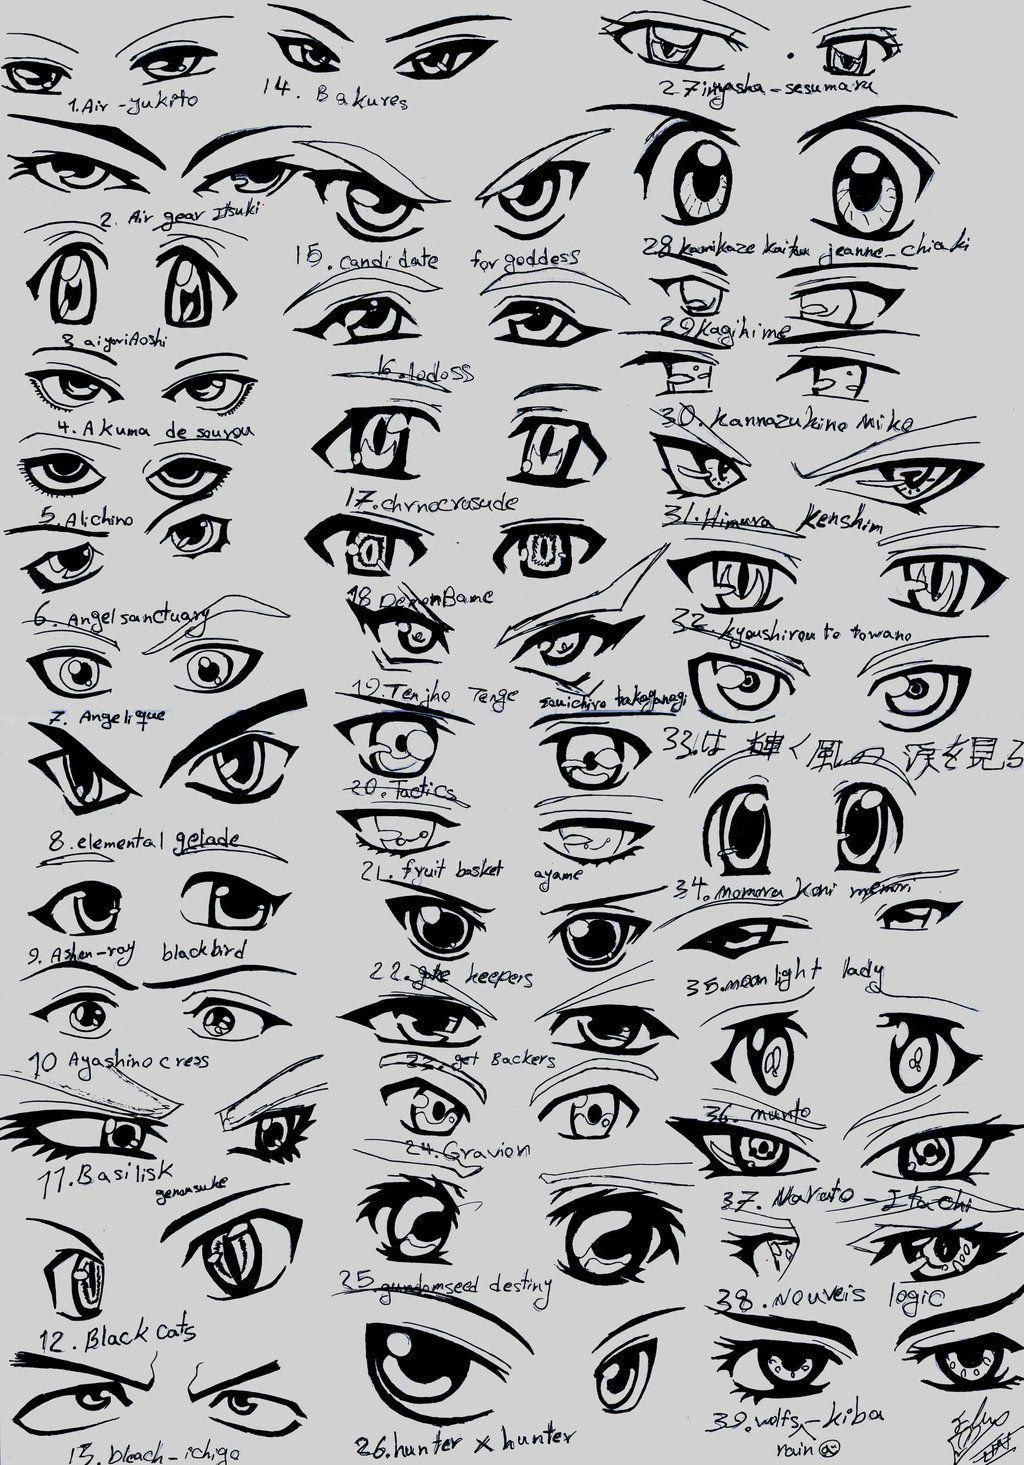 39 Male Anime Eyes How To Draw Anime Eyes Anime Eye Drawing Manga Eyes